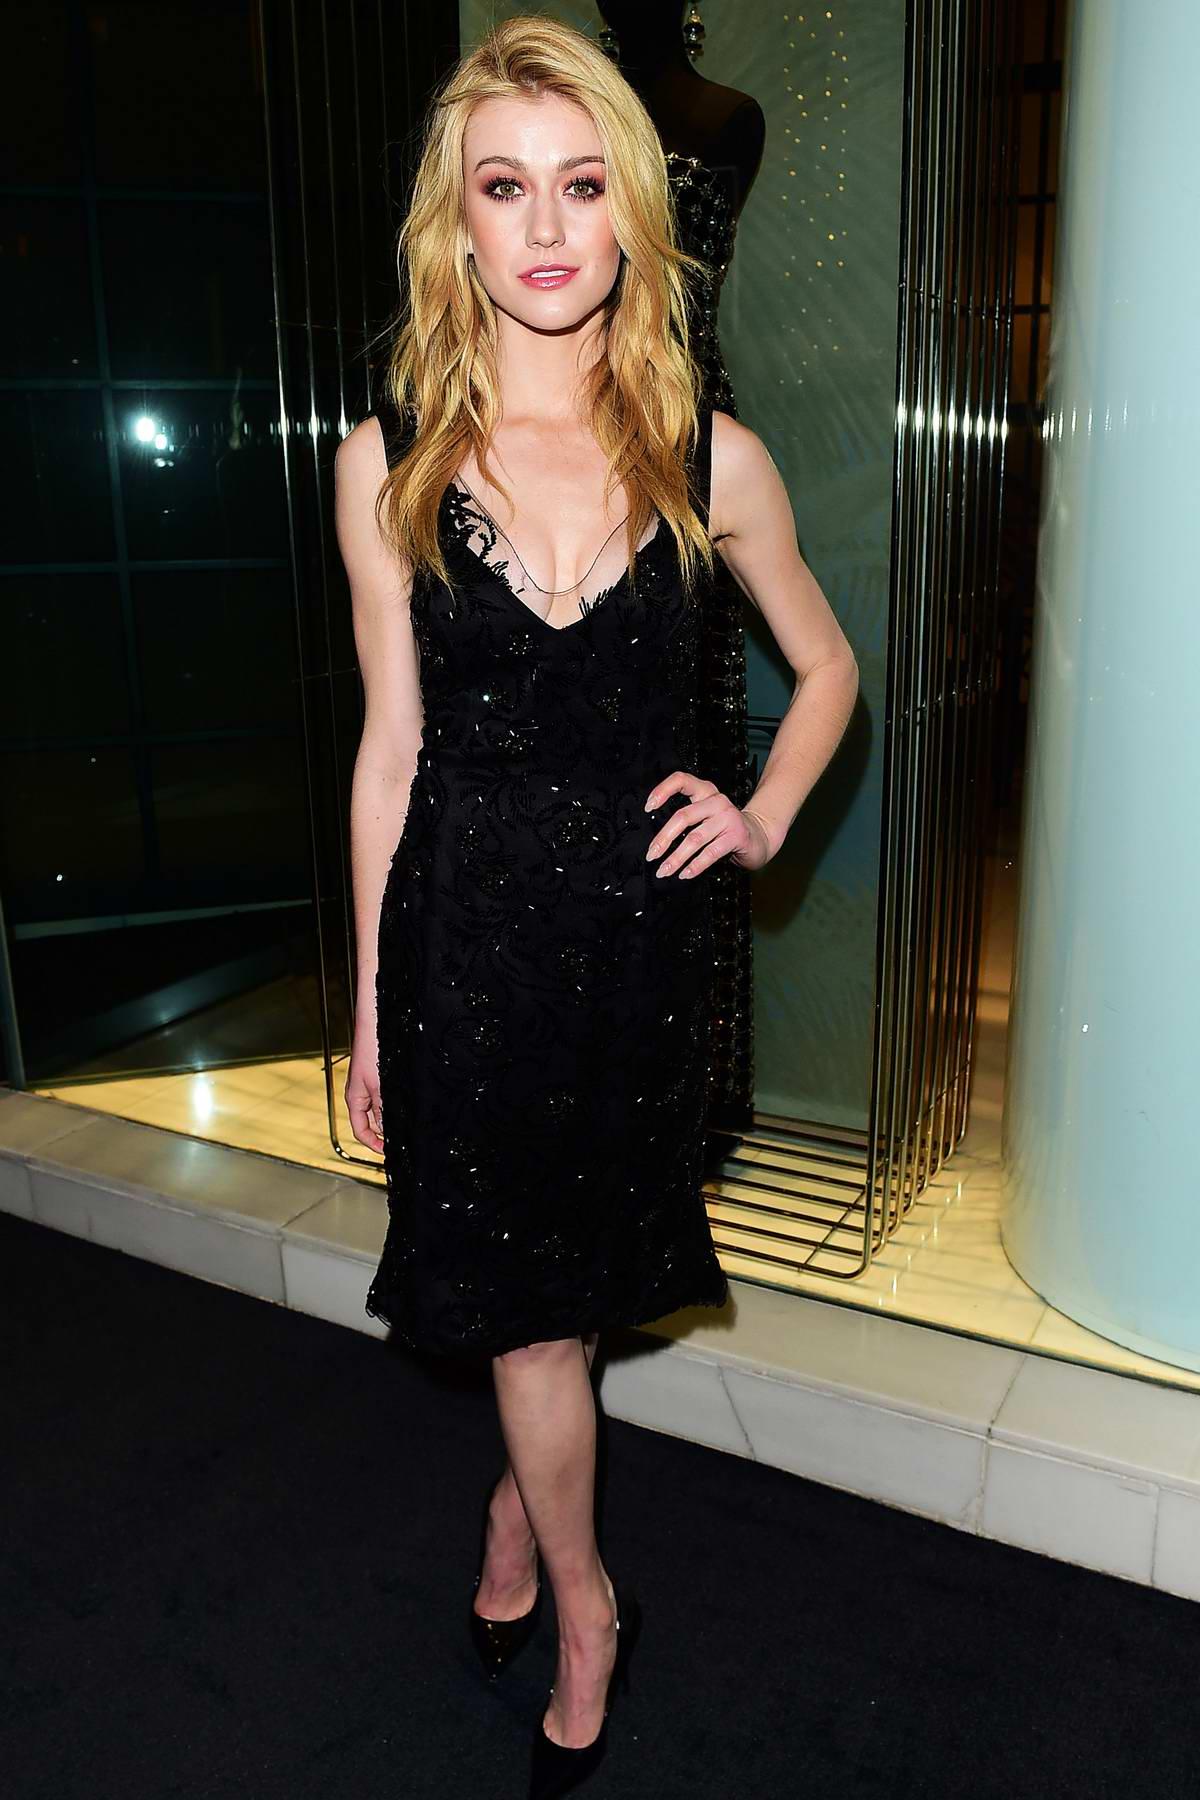 Katherine McNamara attends the Giorgio Armani Pre-Oscar Party in Los Angeles